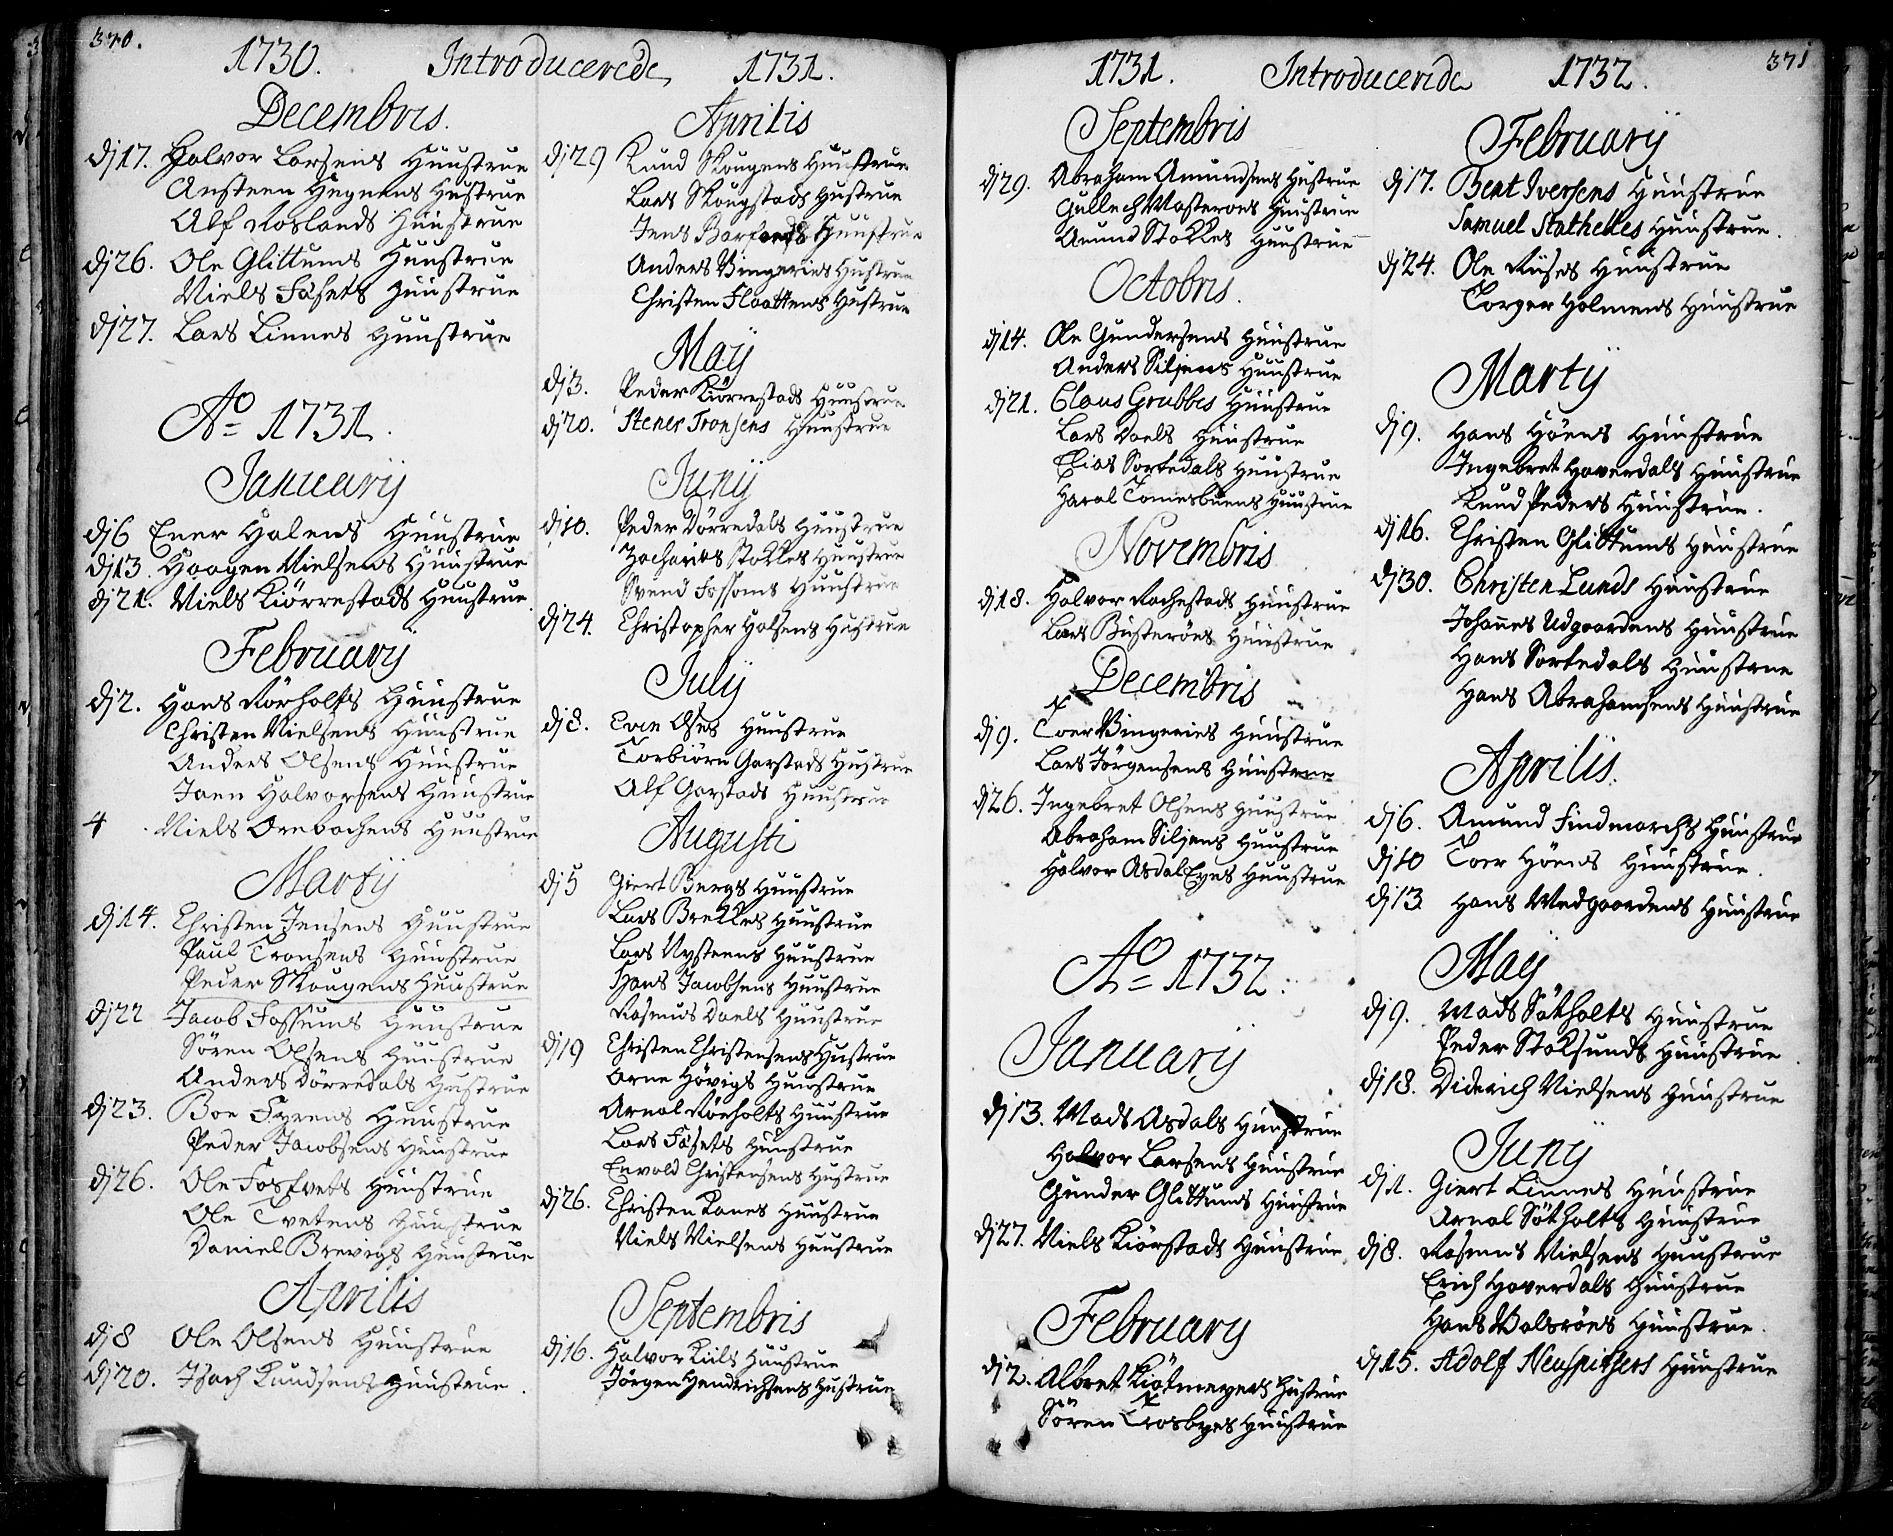 SAKO, Bamble kirkebøker, F/Fa/L0001: Ministerialbok nr. I 1, 1702-1774, s. 370-371